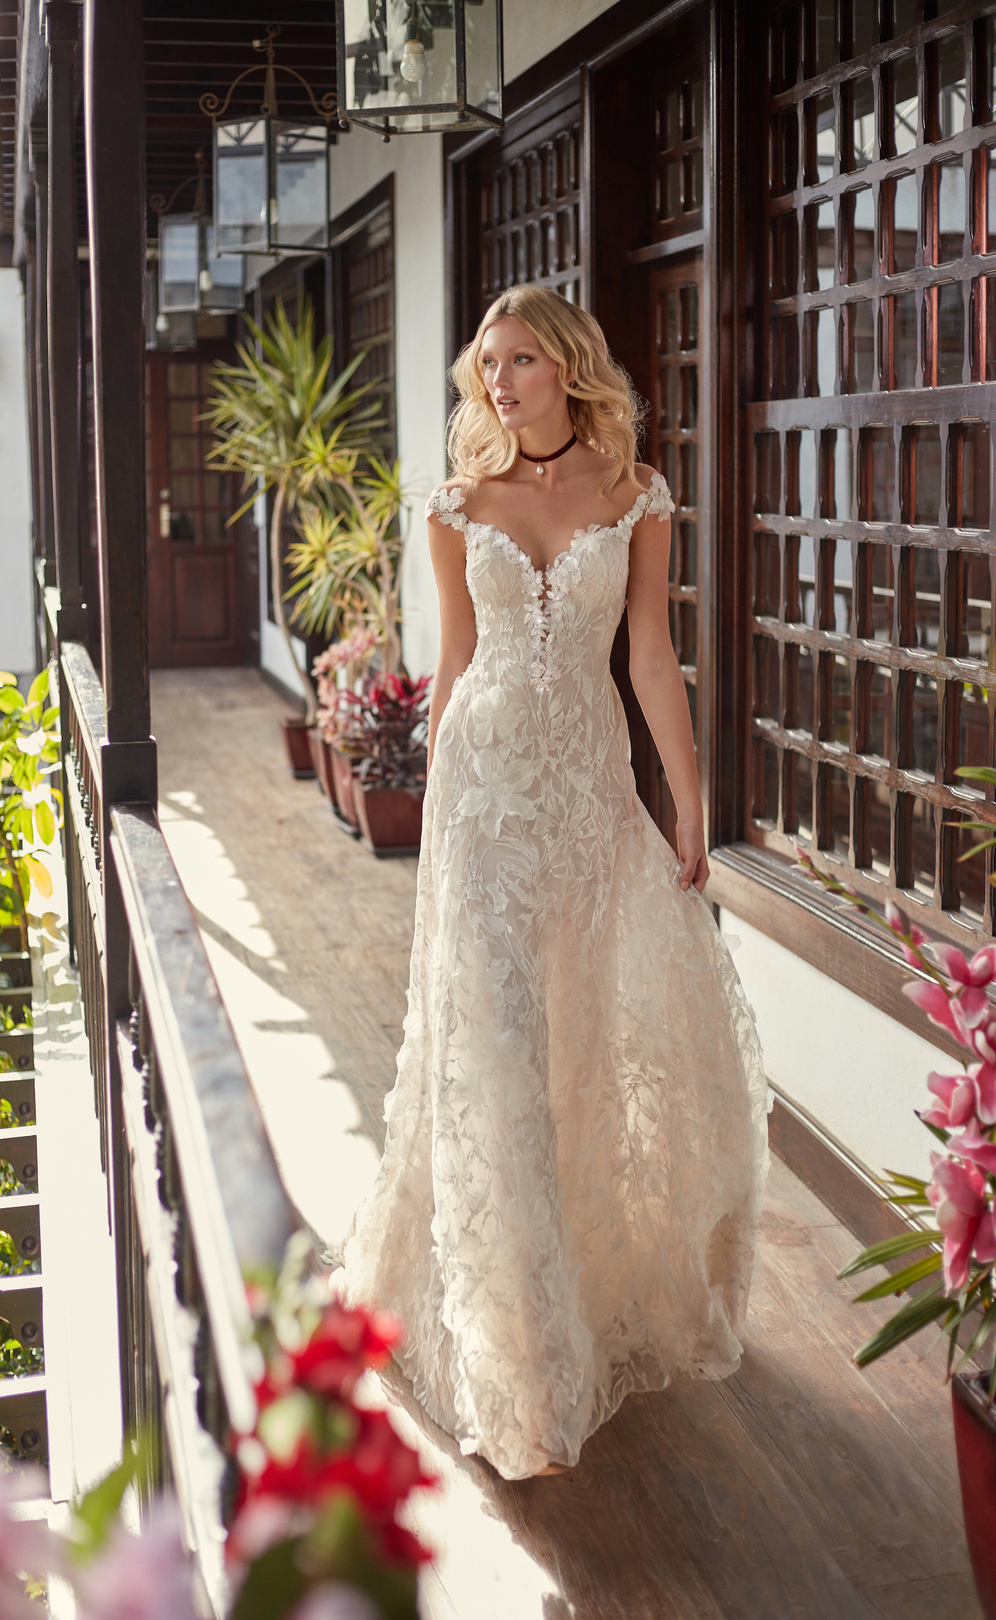 bryony dress photo